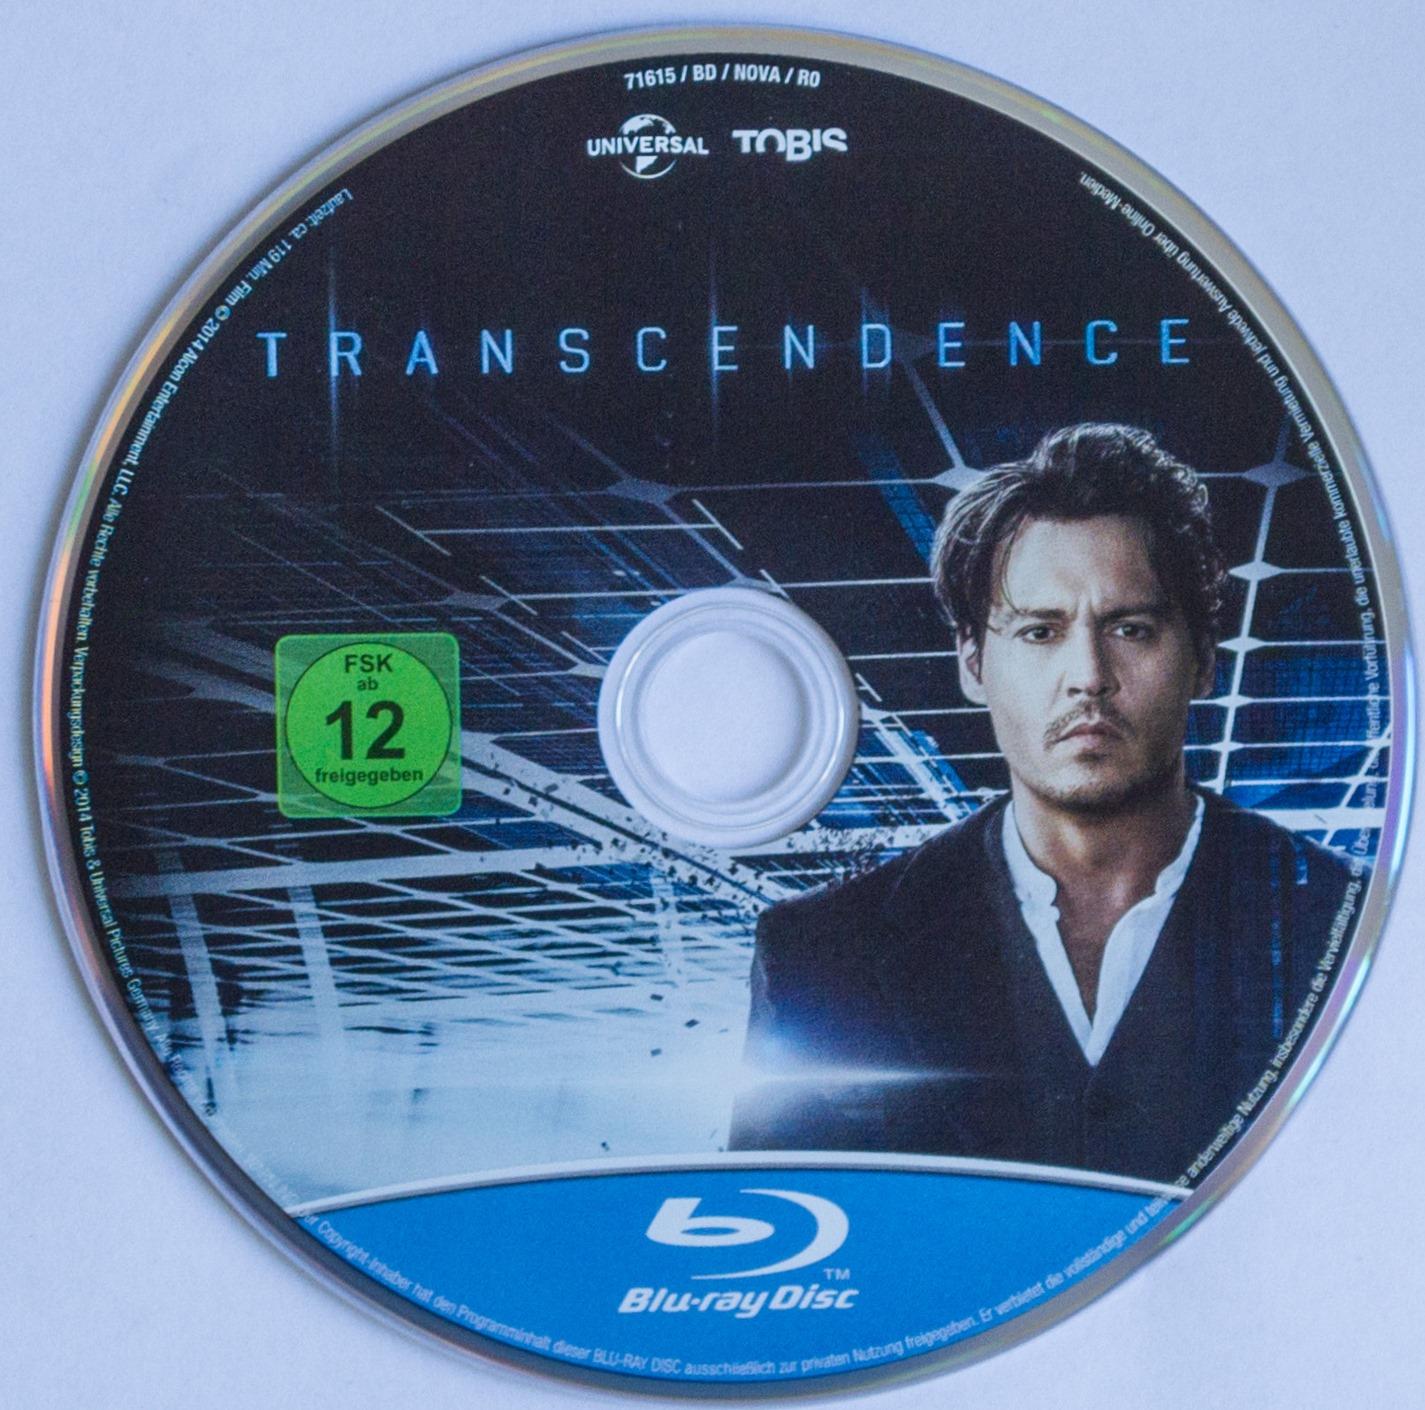 Transcendence Disk